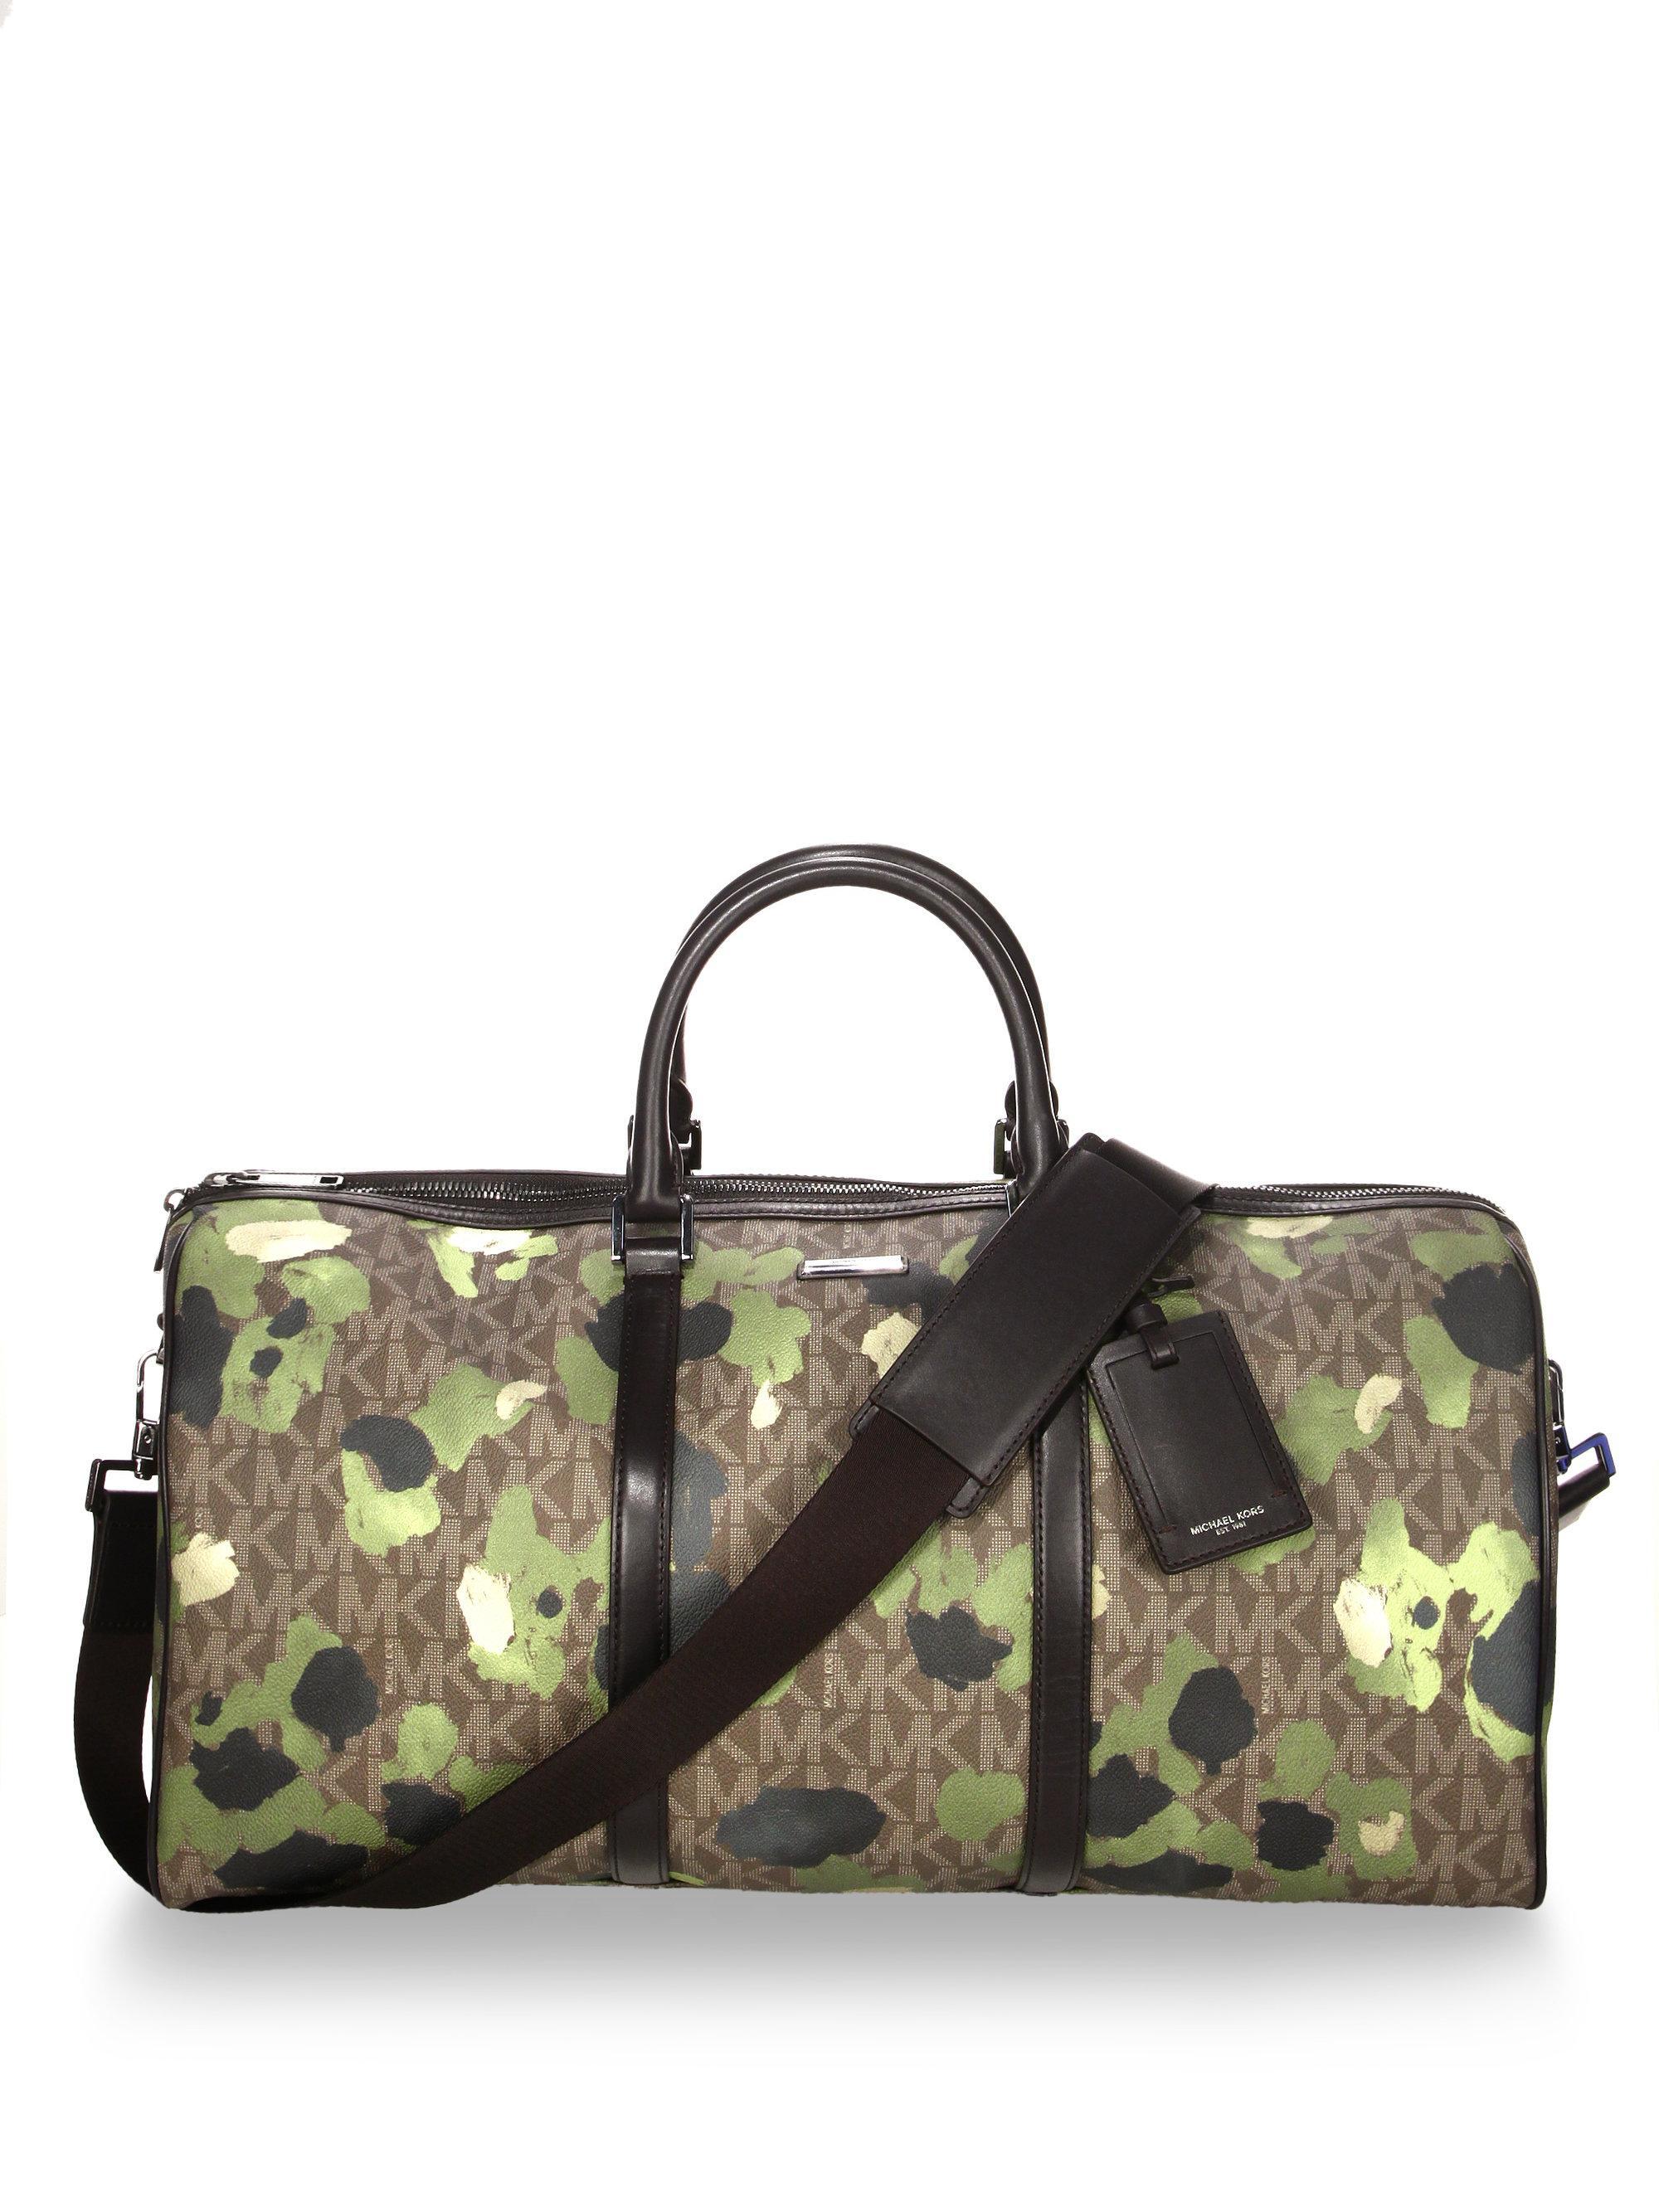 1064bac33c0 Lyst - Michael Kors Camouflage Print Large Duffle Bag for Men